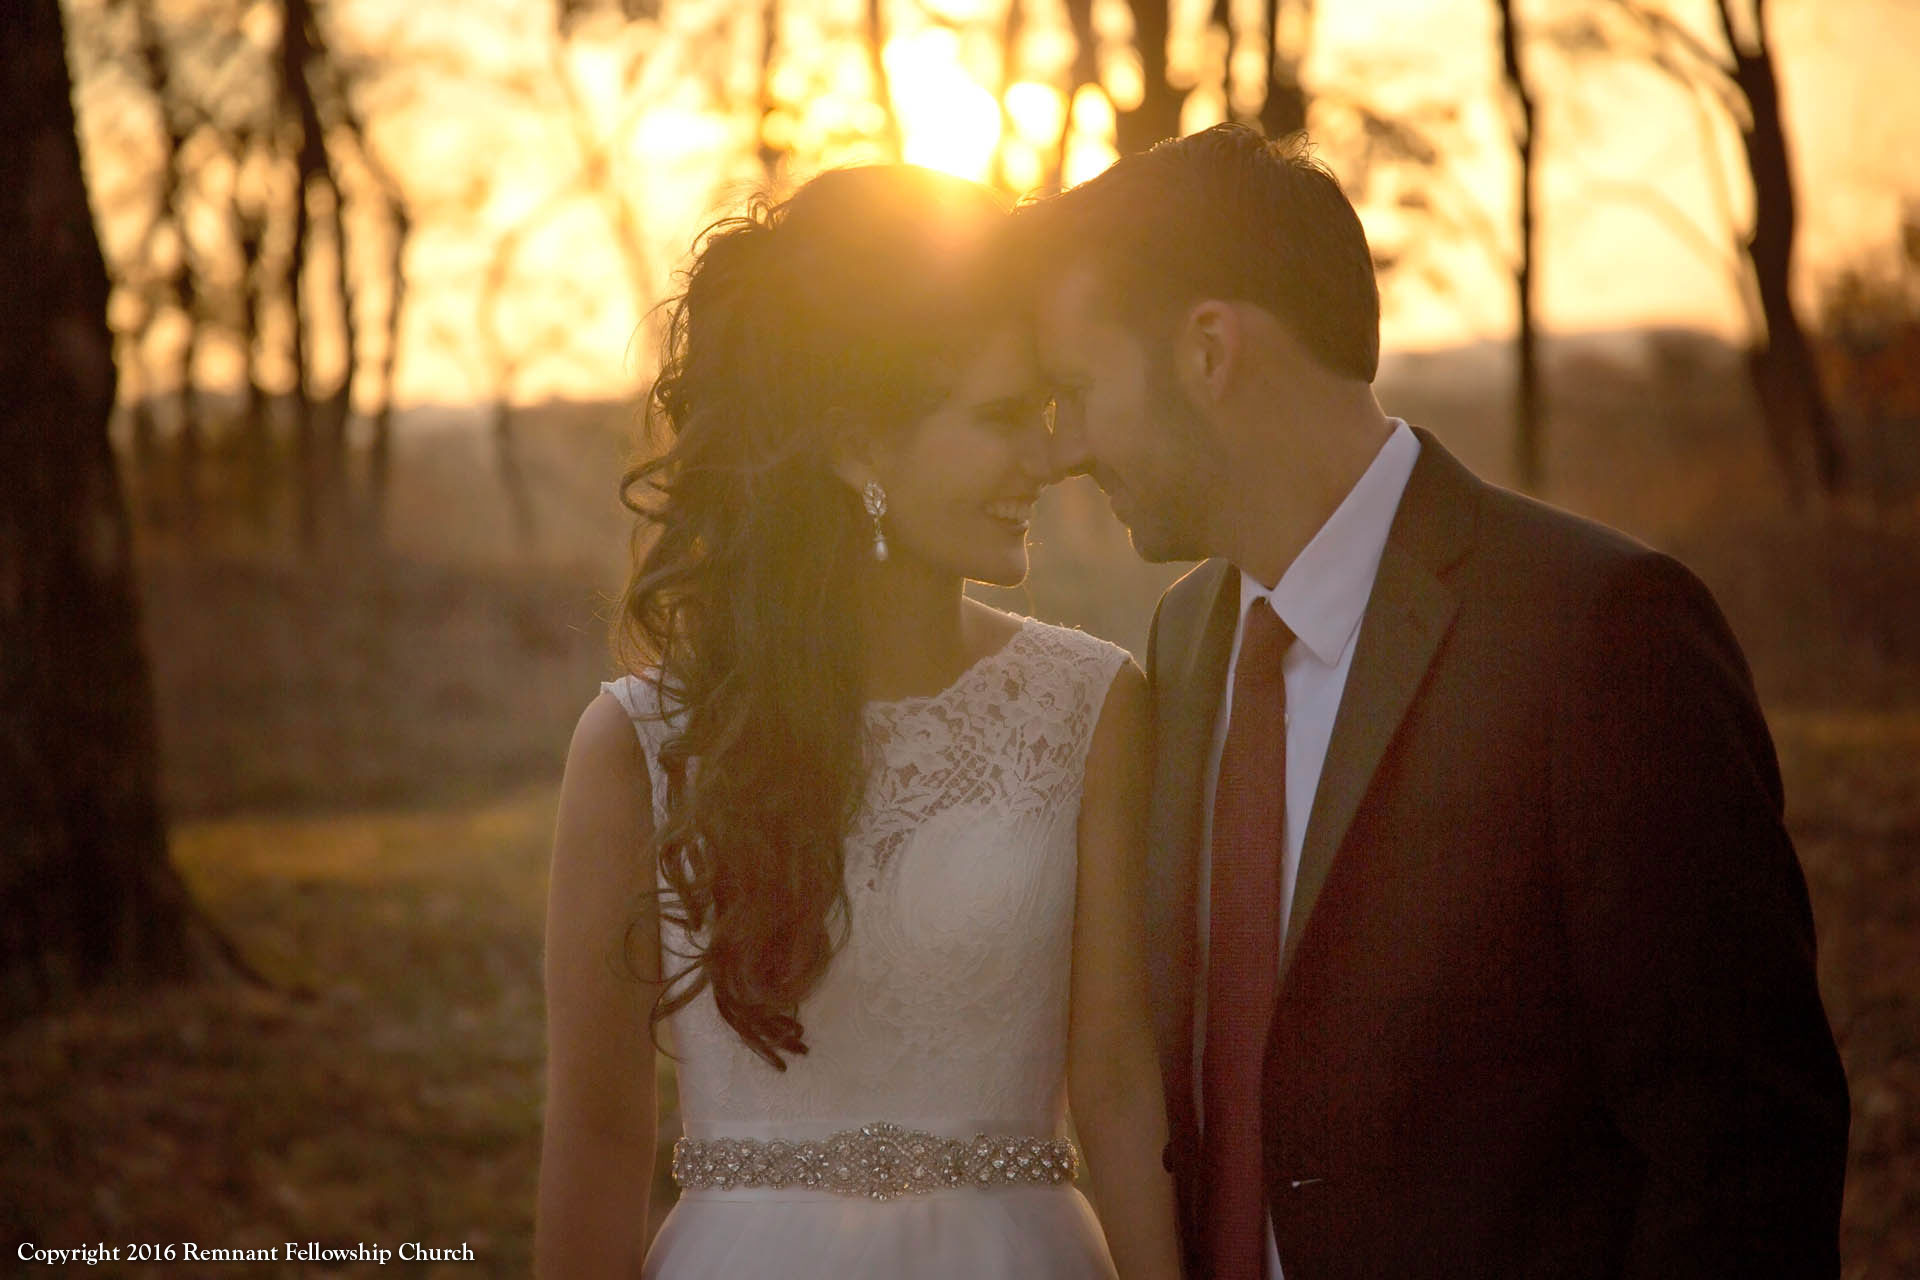 newdayIMG_4431-Remnant-Fellowship-Hagans-Wedding-Bride-Groom-PhotoShoot9